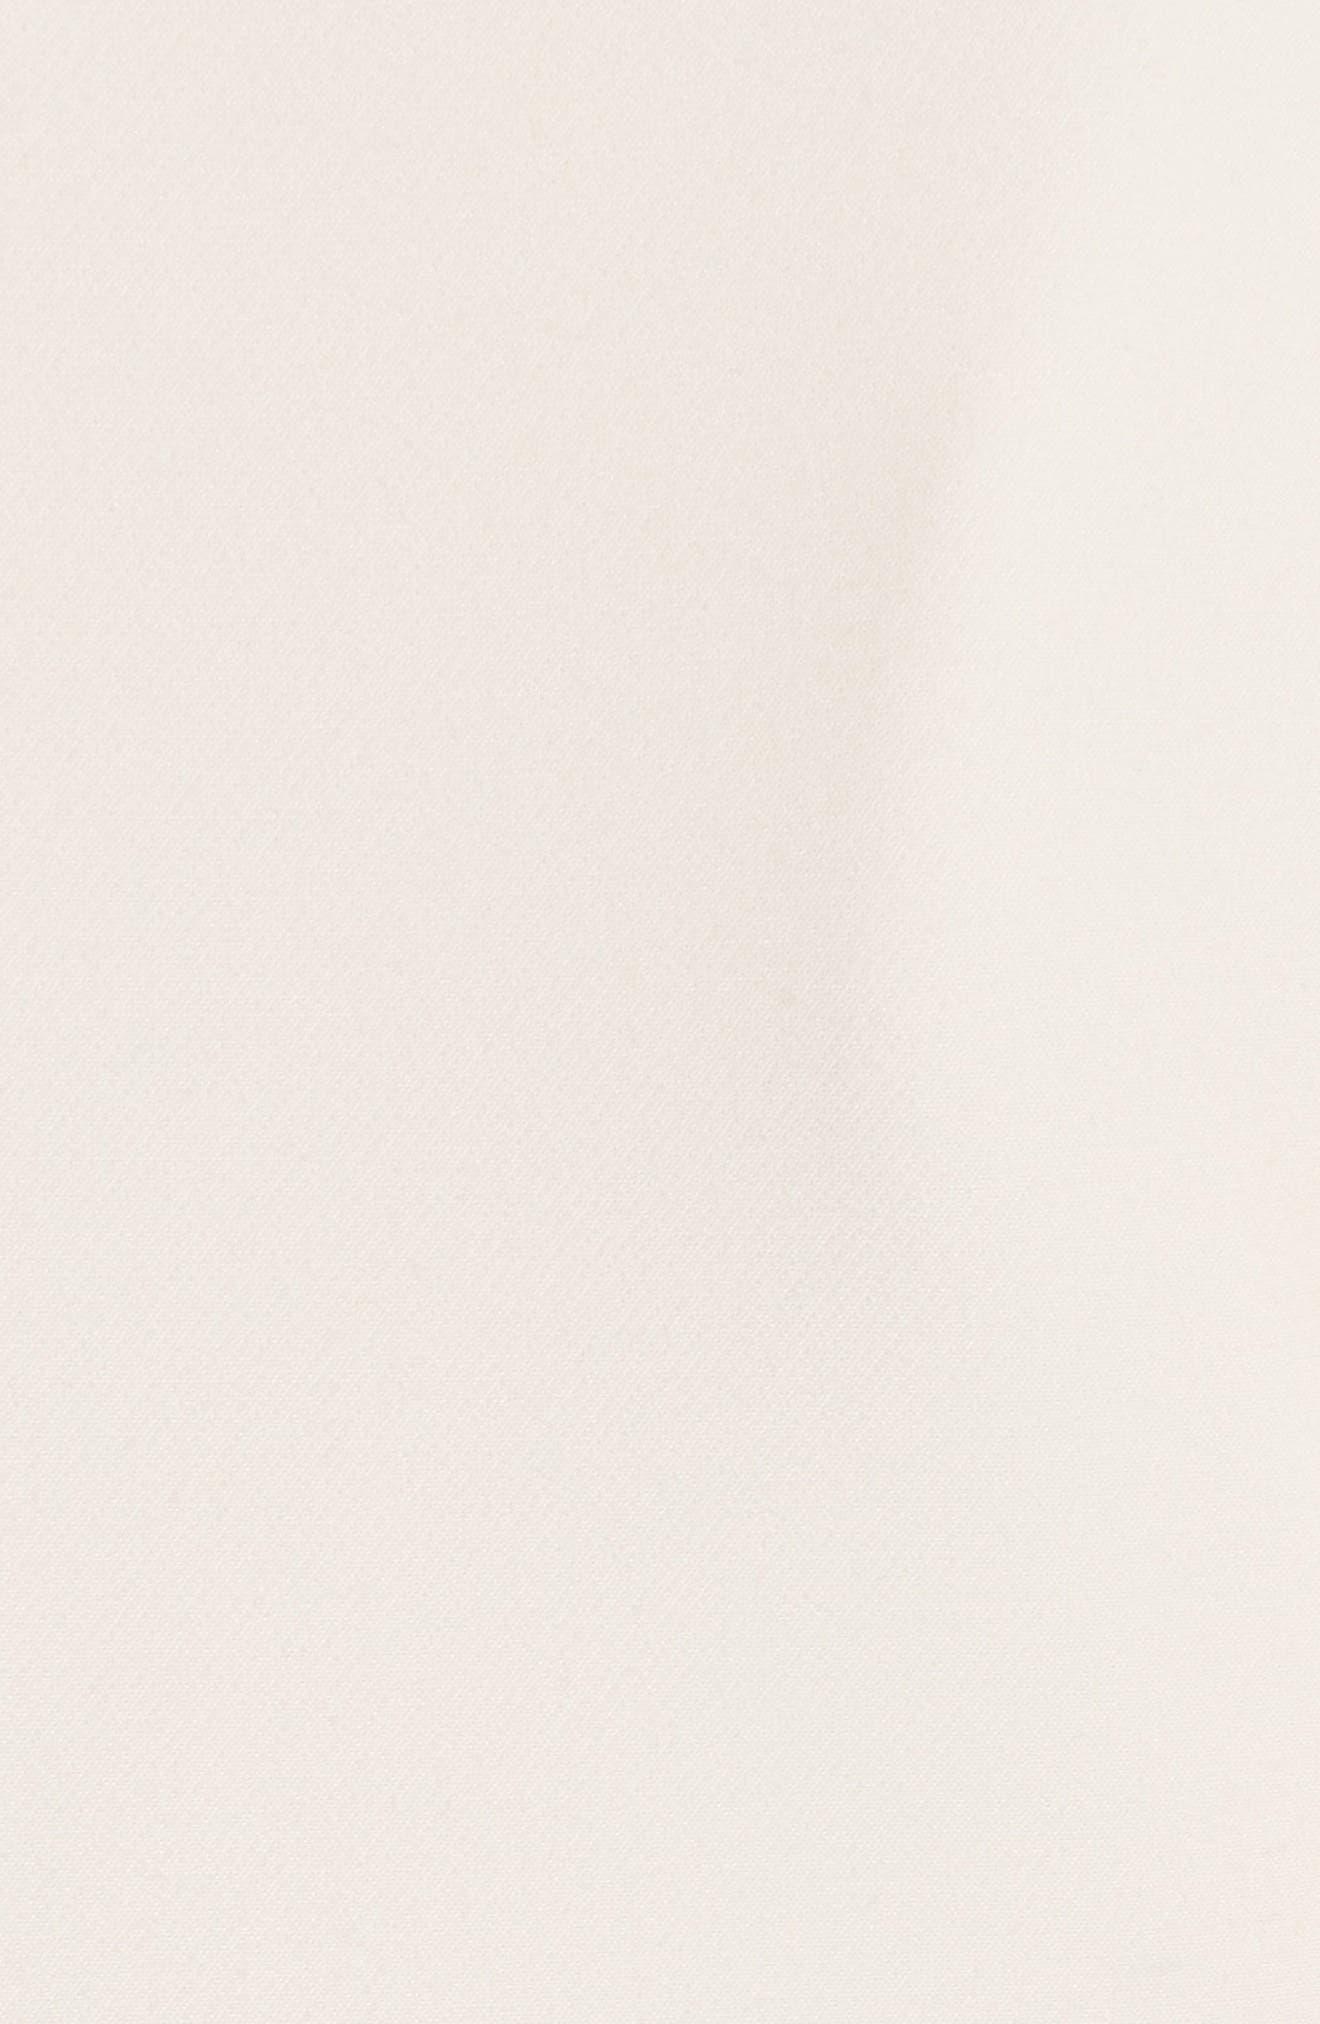 Ruffle Trim Suit Dress,                             Alternate thumbnail 5, color,                             Cream Combo